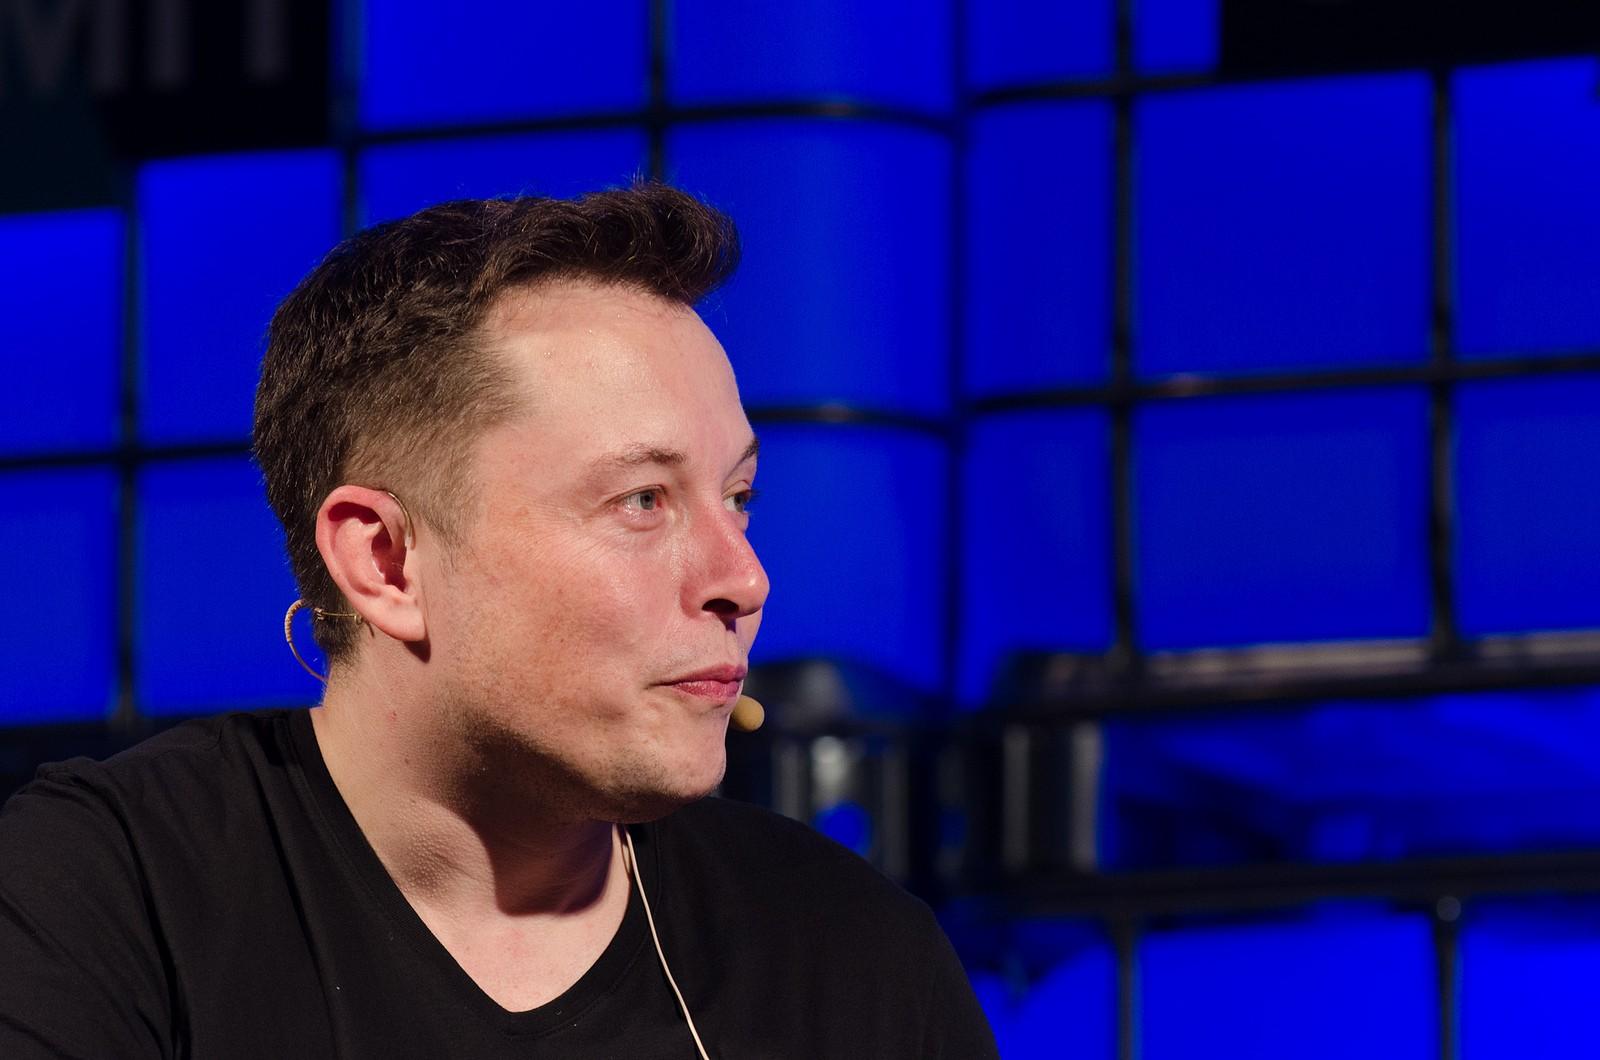 Elon Musk, dono da Tesla, preocupa investidores da empresa por causa do seu comportamento na internet (Foto: Flickr/Heisenberg Media/Creative Commons)